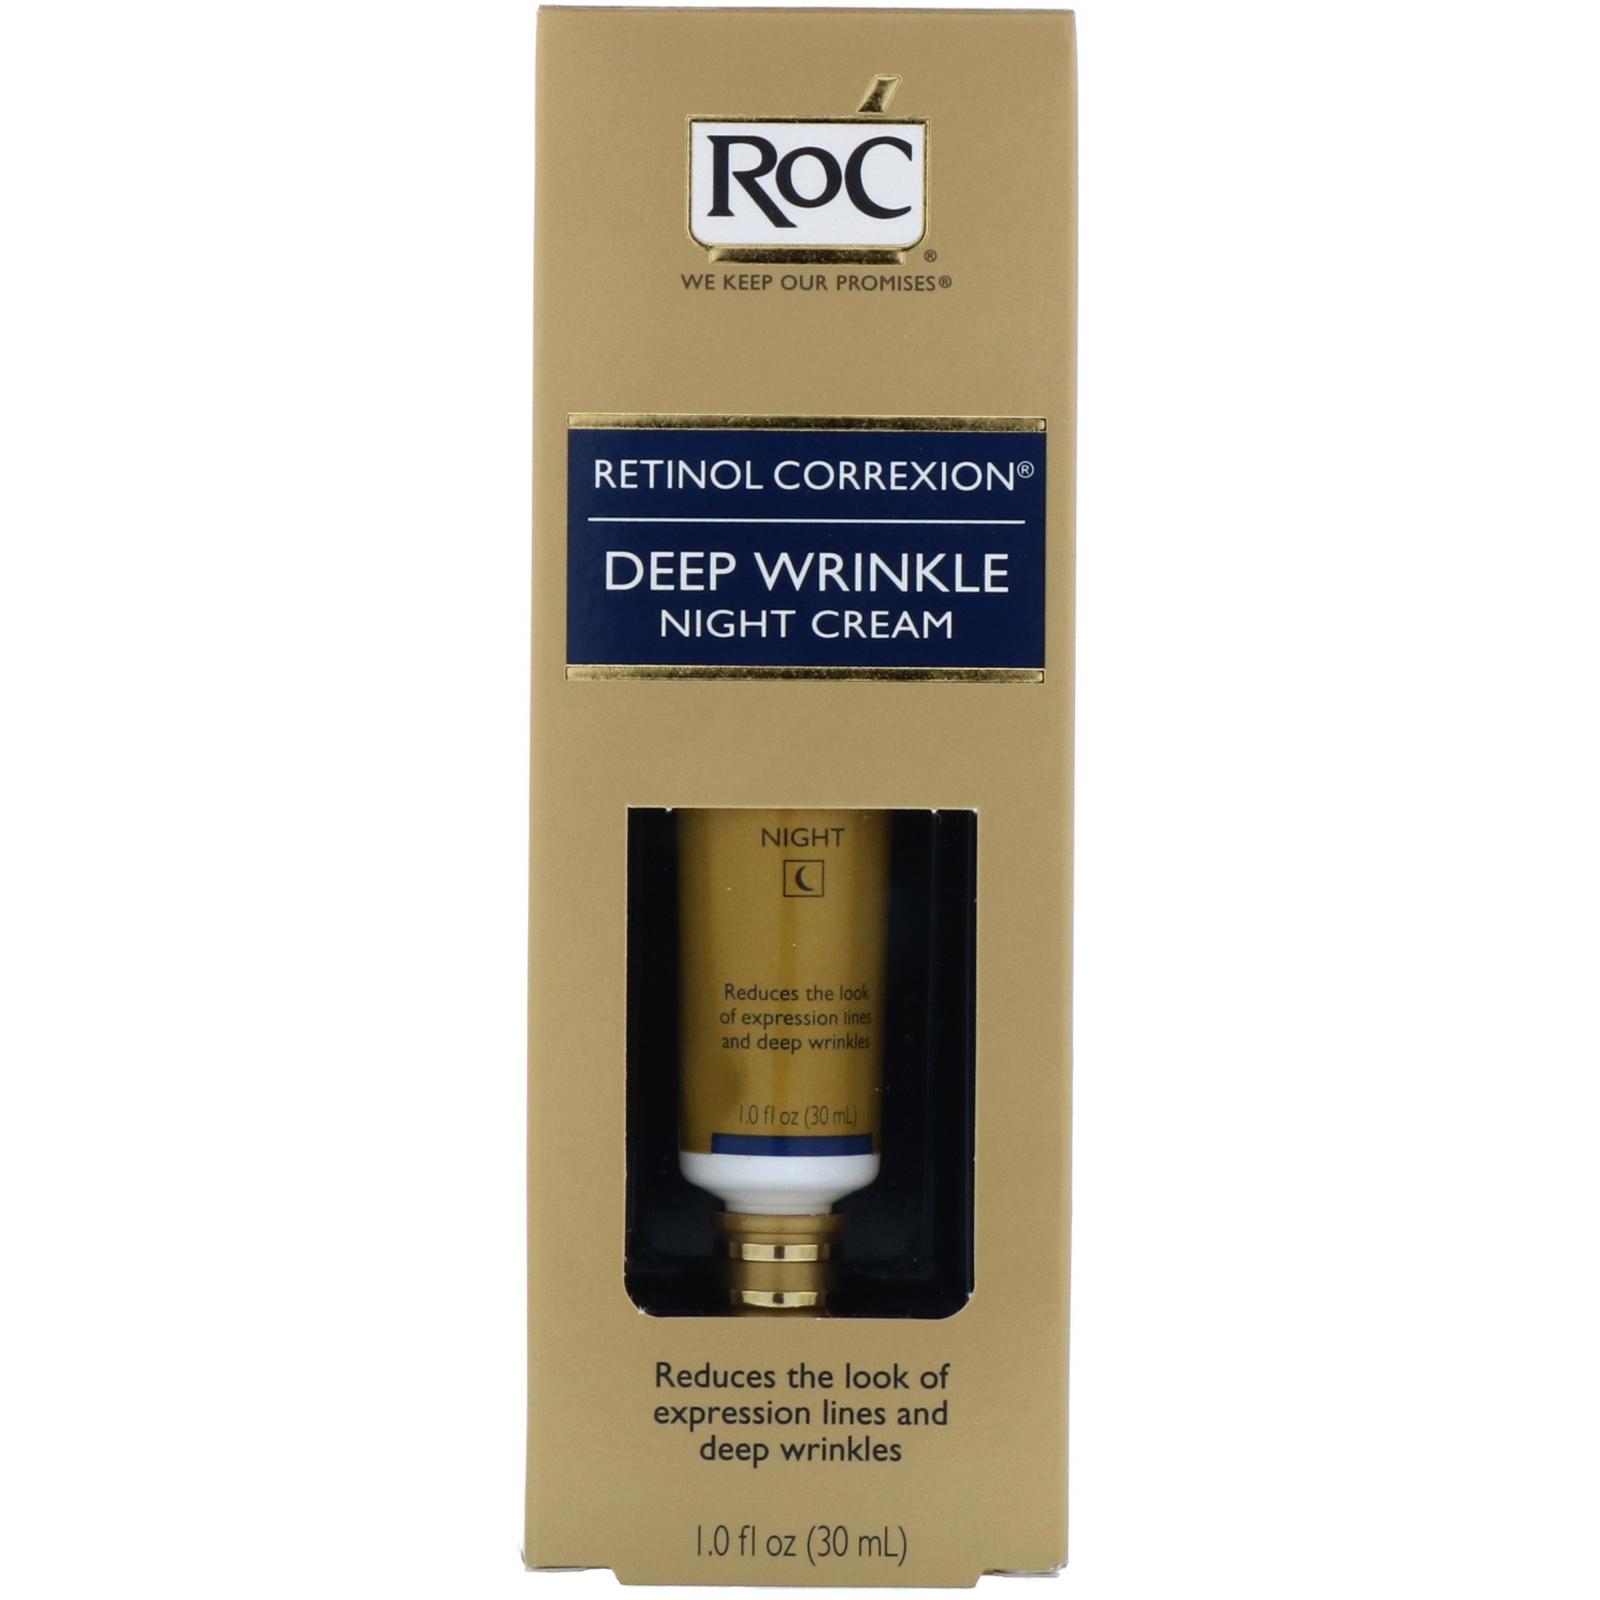 RoC, Retinol Correxion, Deep Wrinkle Night Cream, 1 0 fl oz